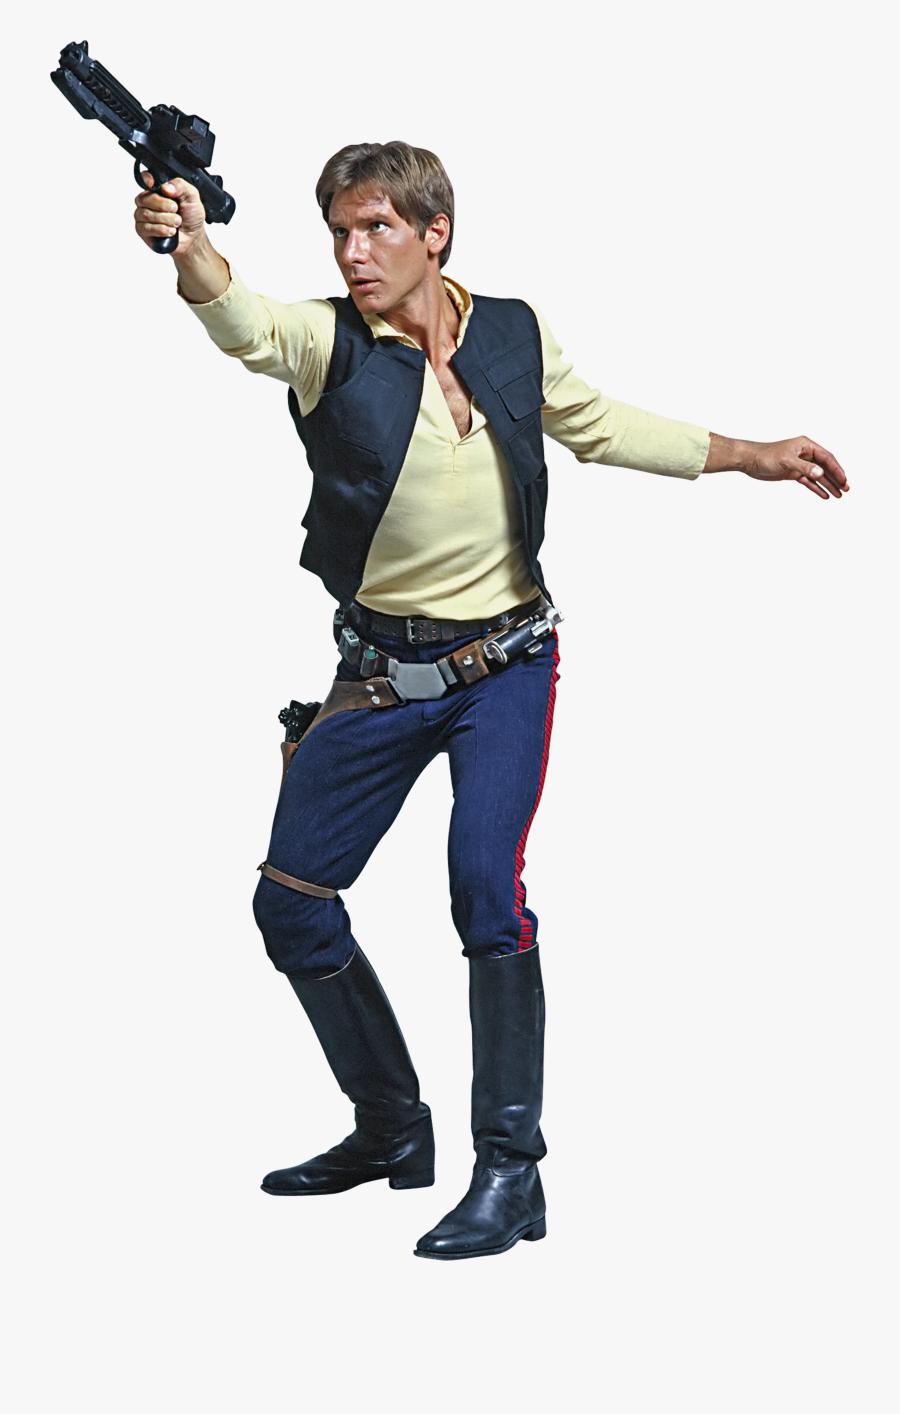 Han Solo Luke Skywalker Chewbacca Leia Organa Solo - Star Wars Han Solo Png, Transparent Clipart